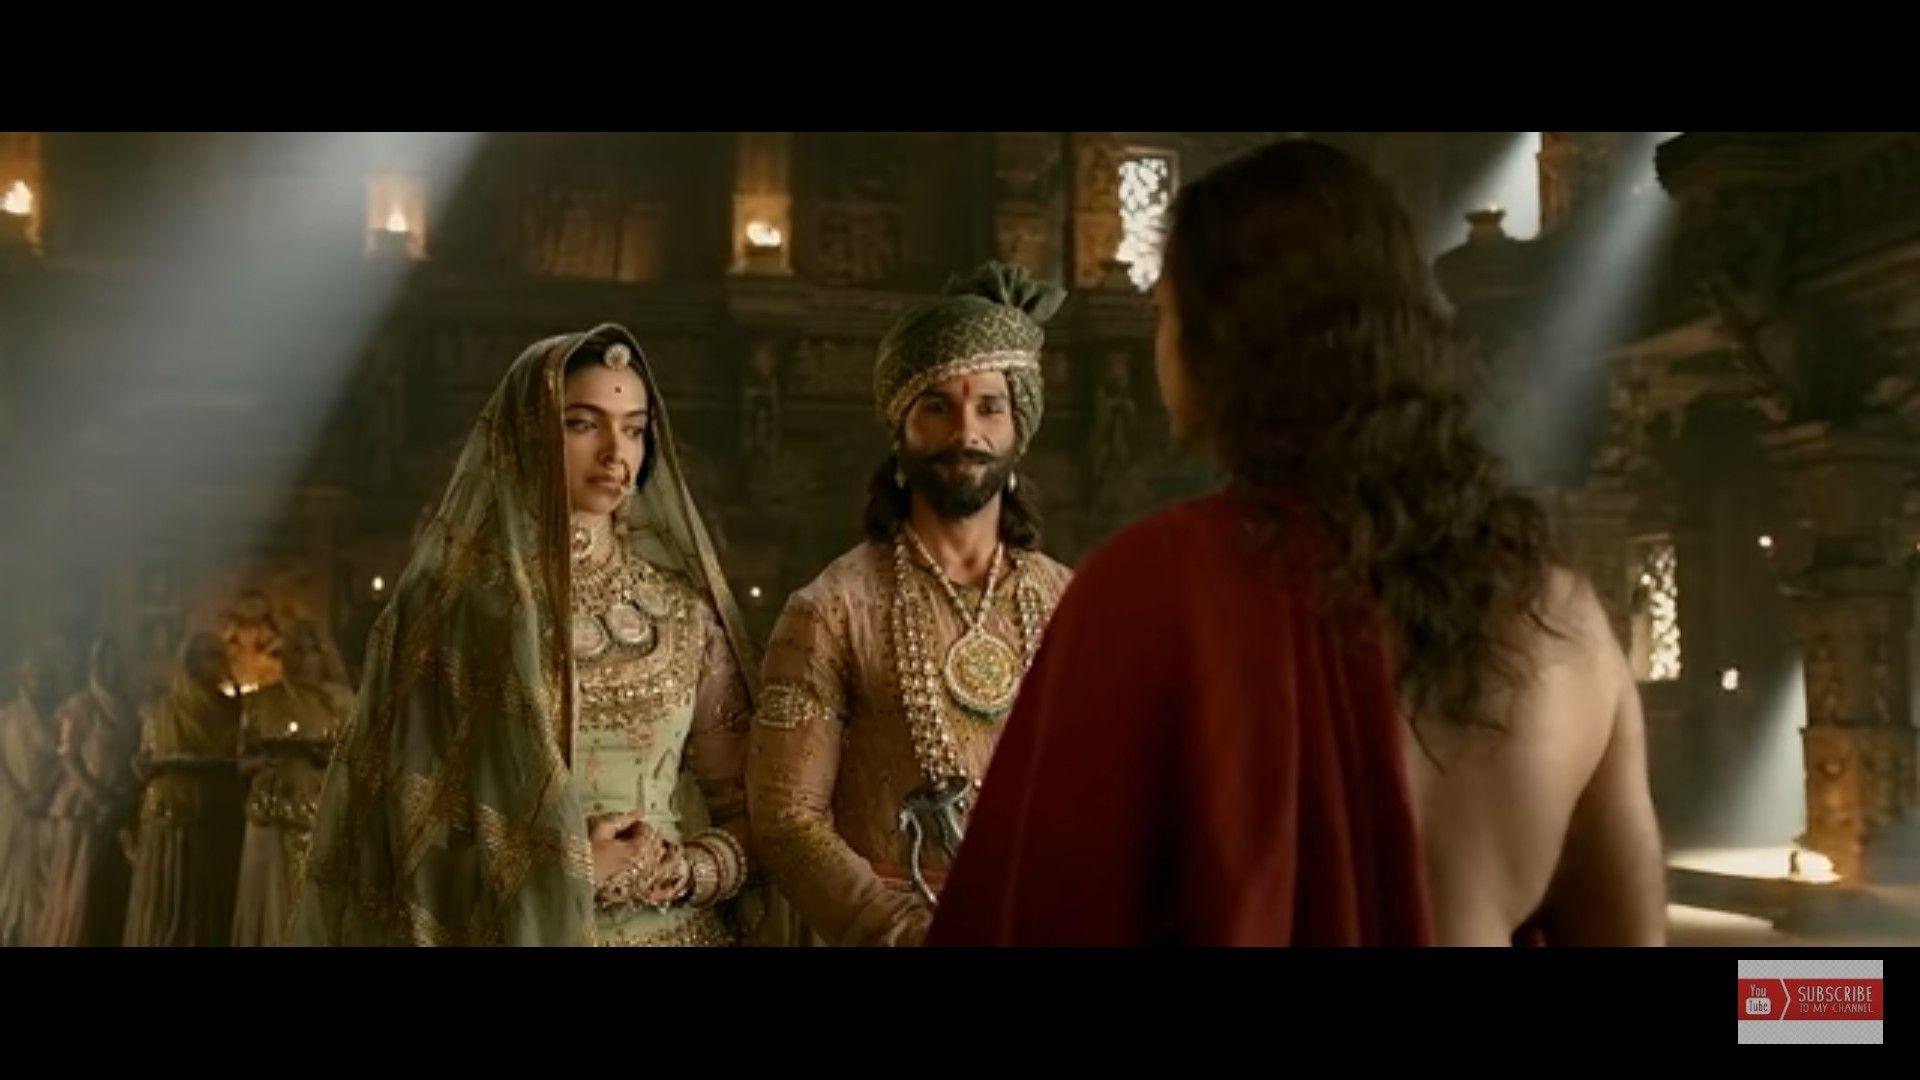 Pin By Kk On Stuff To Buy Padmavati Movie Historical Film Film Story